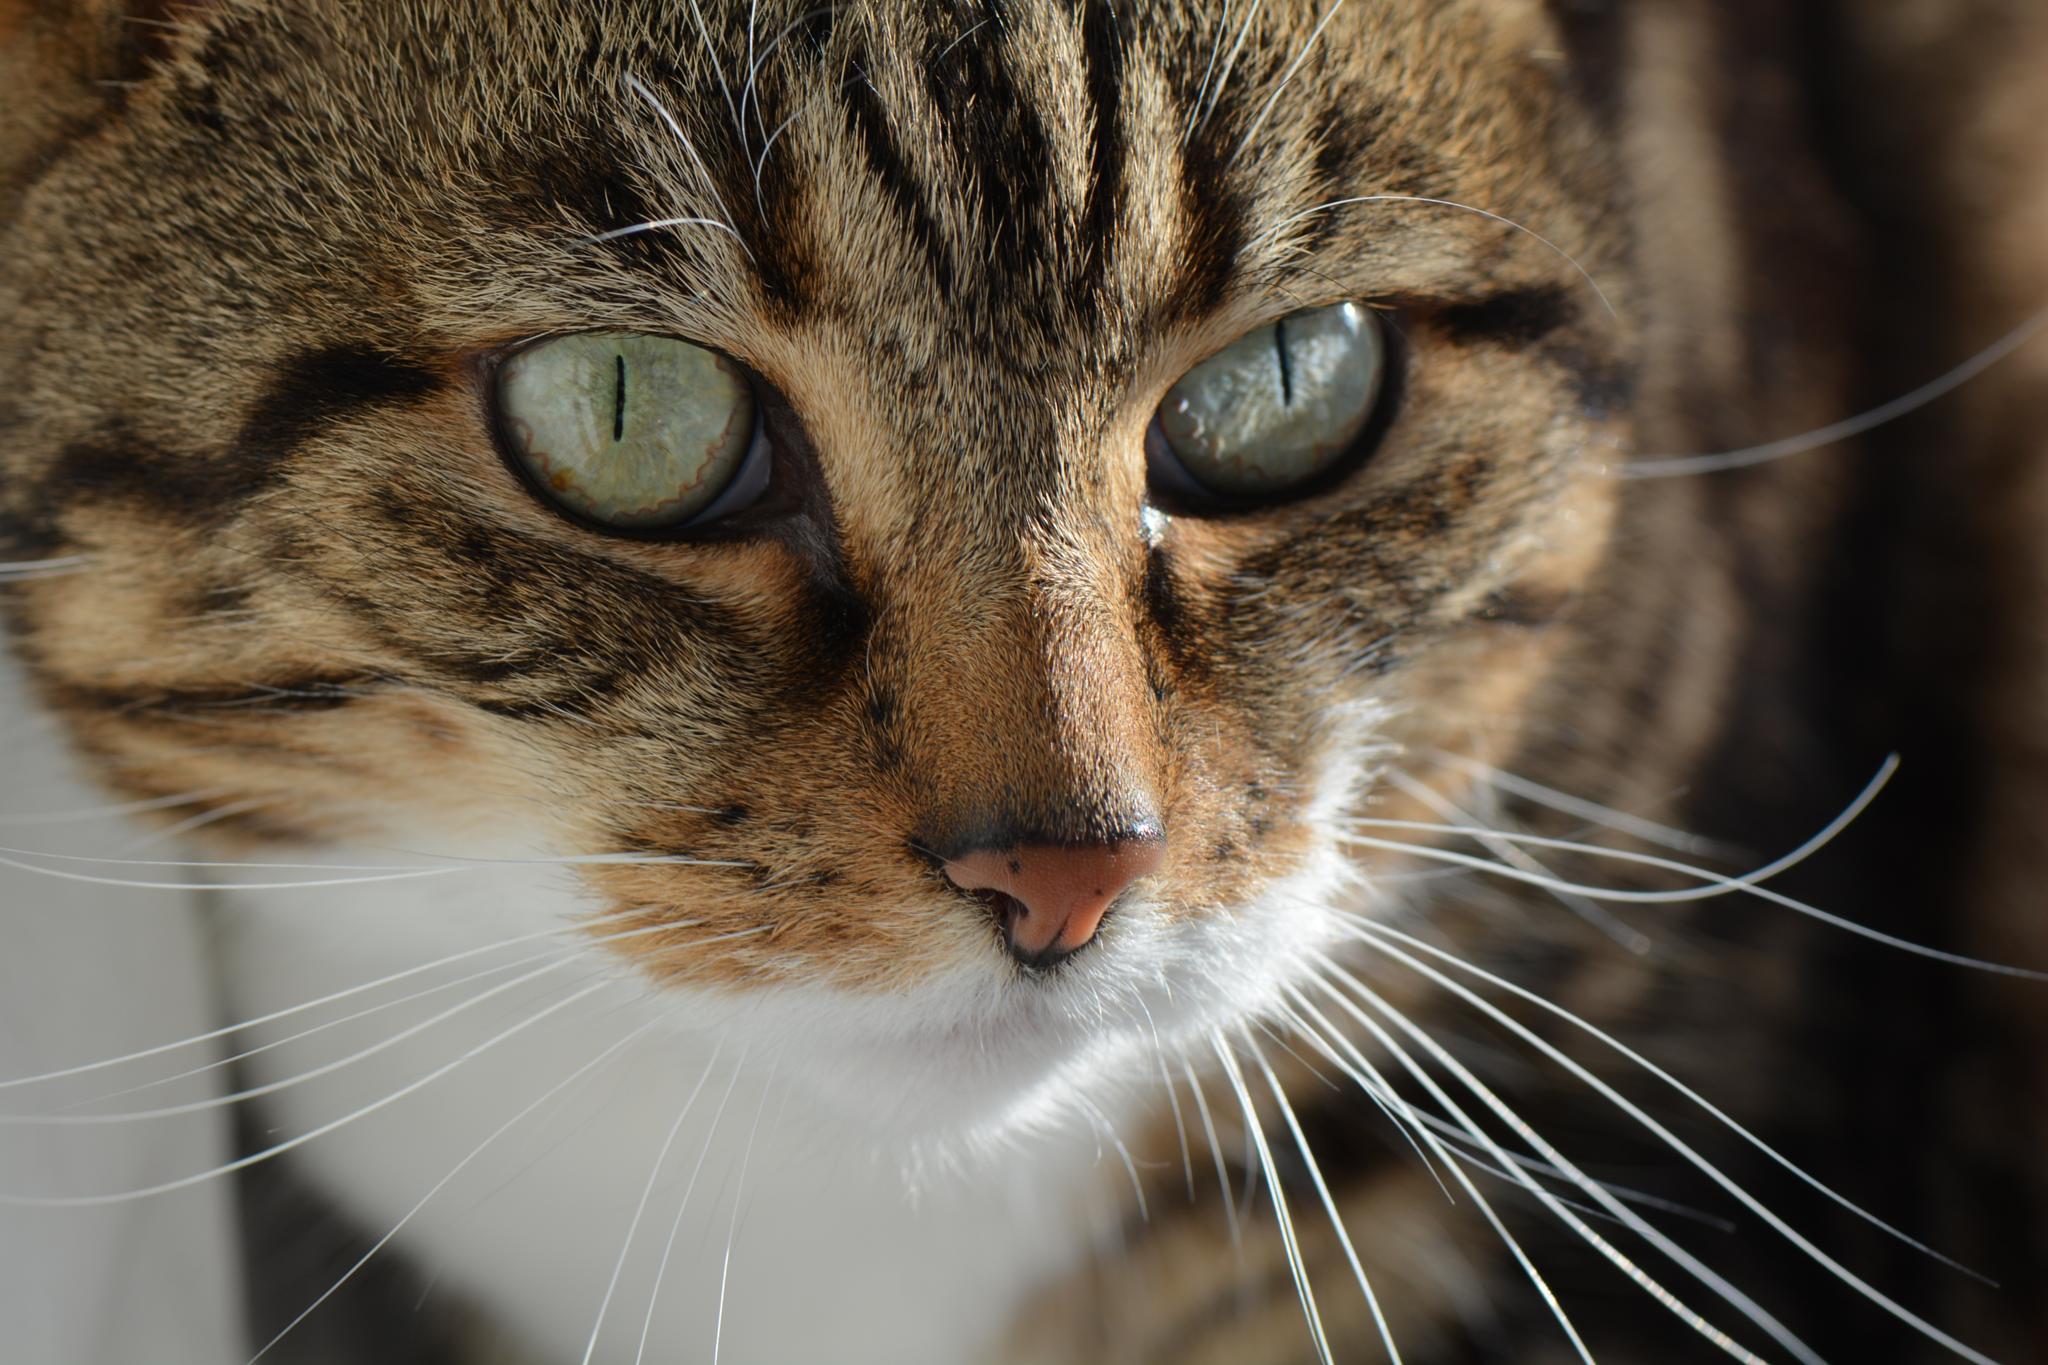 The Cat by paul.tyler.564